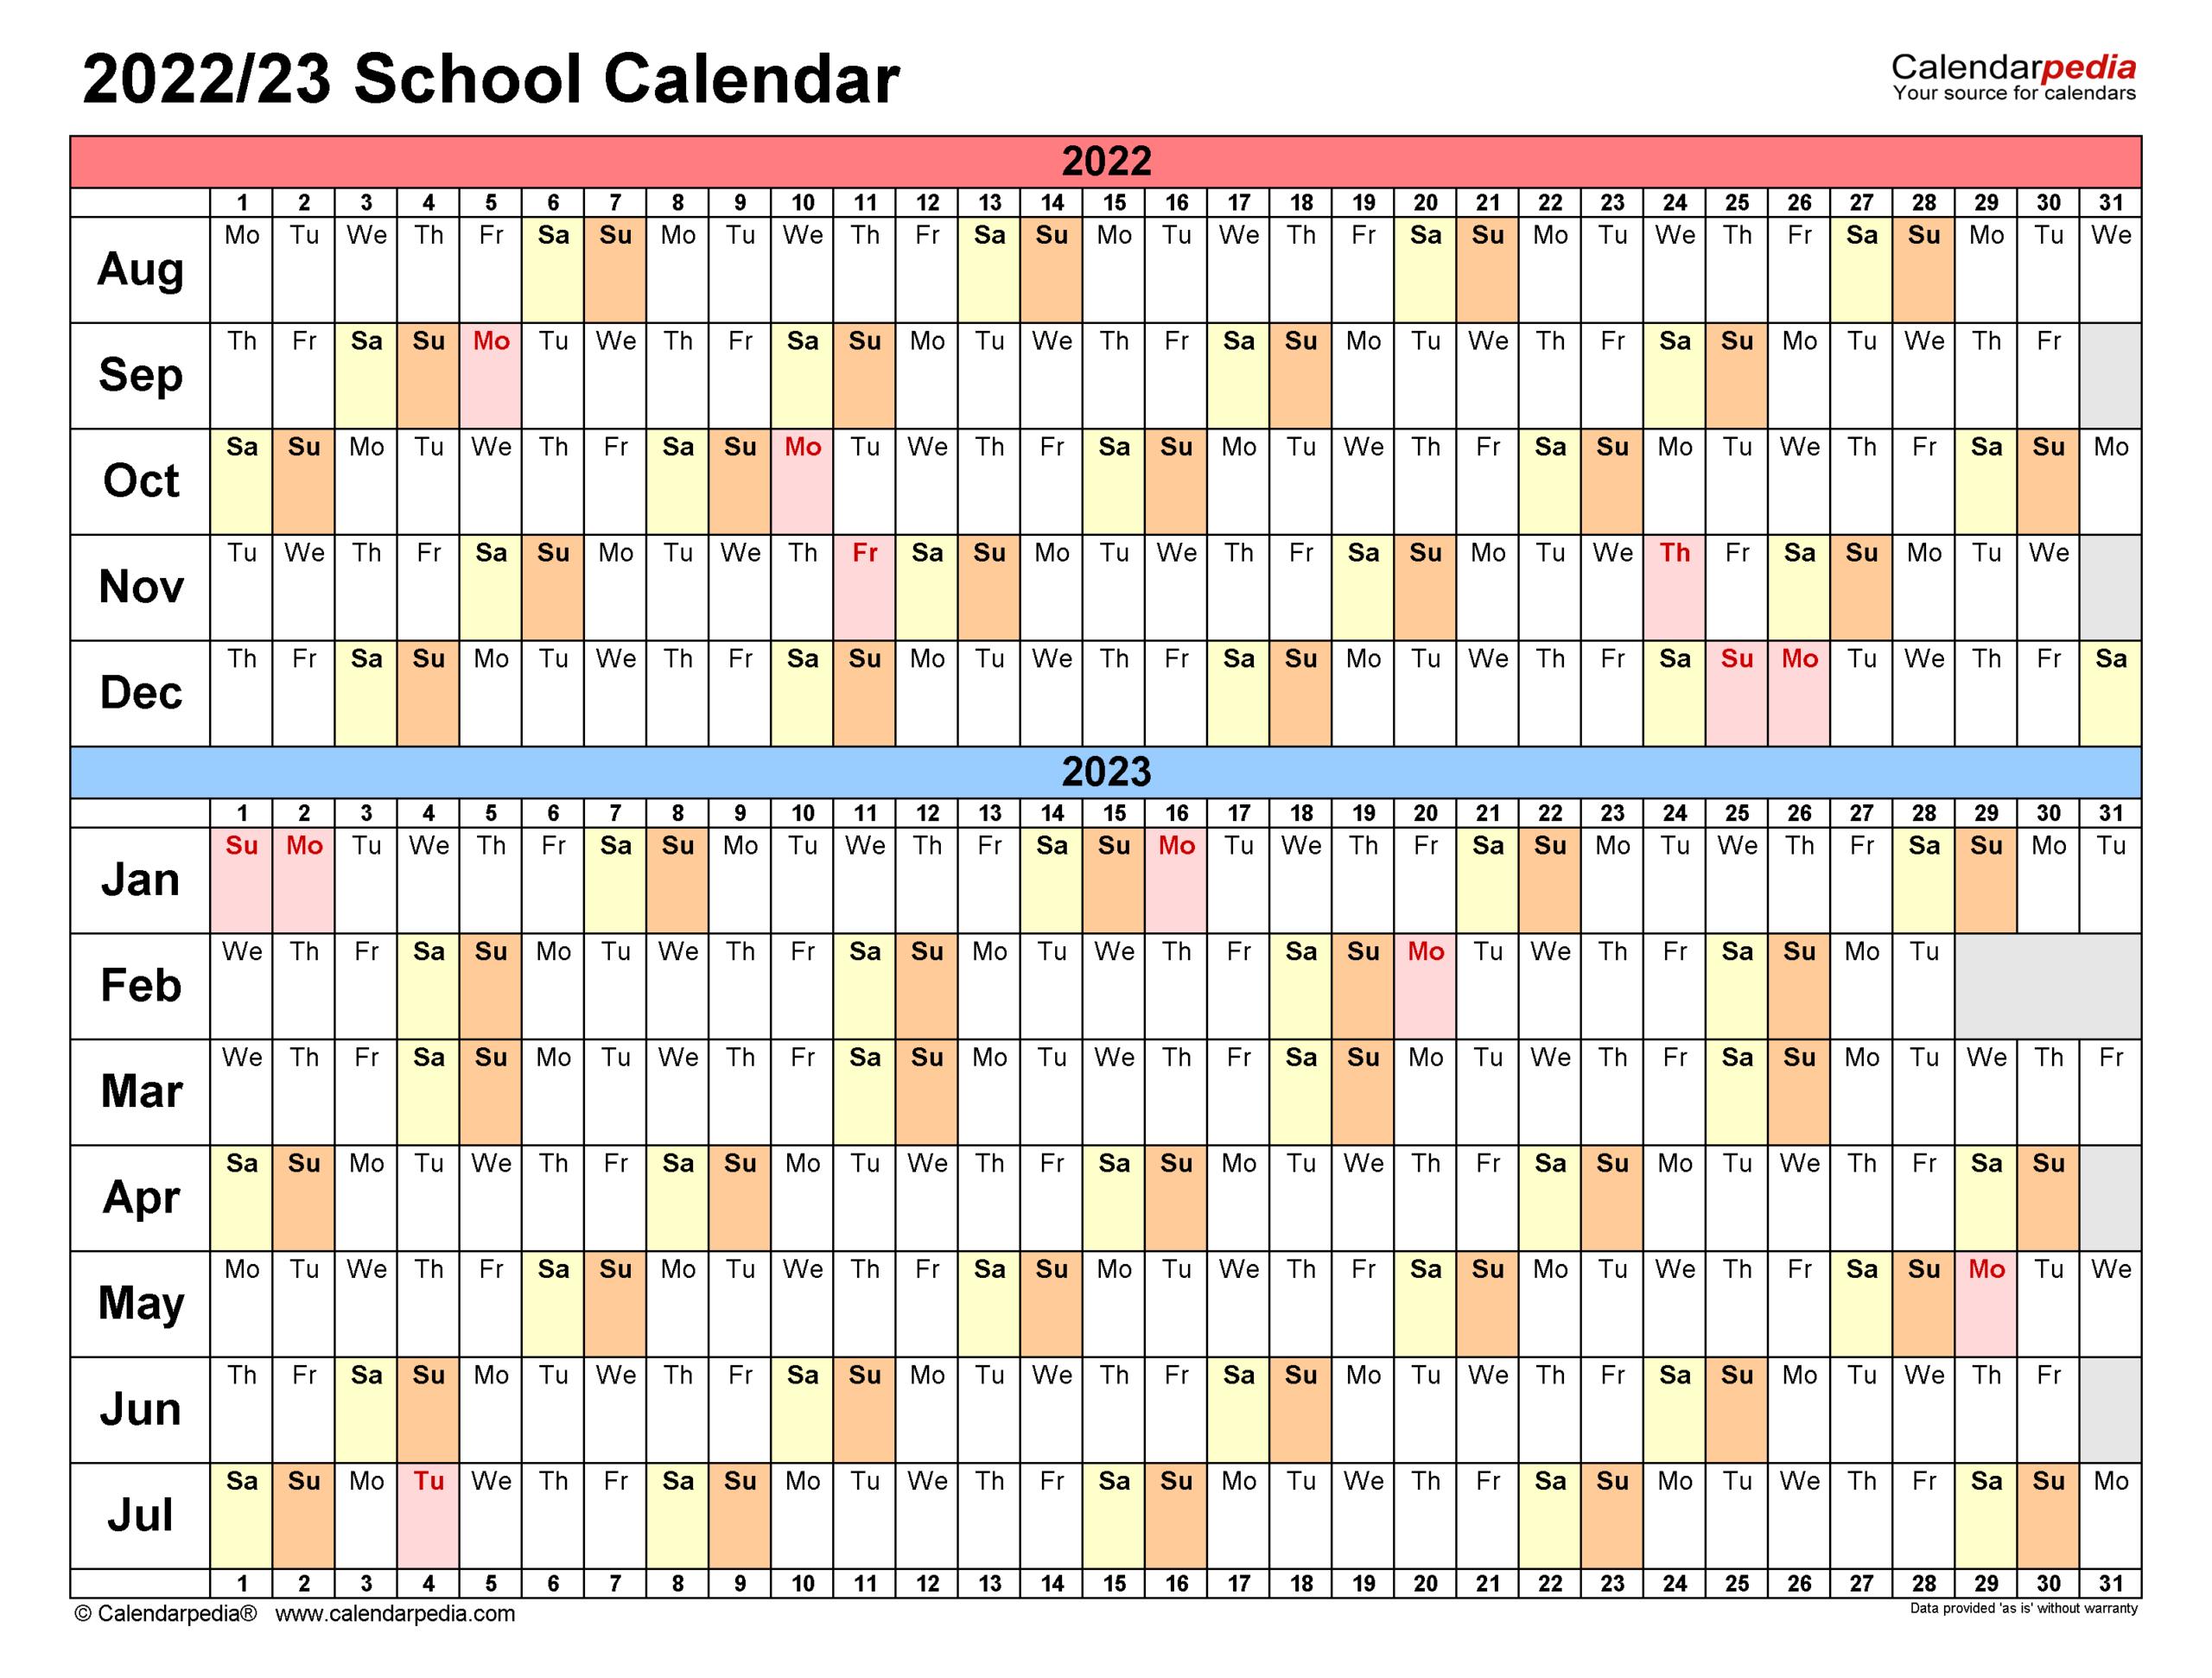 School Calendars 2022/2023 - Free Printable Pdf Templates regarding Aiken County 2022 2023 School Calendar